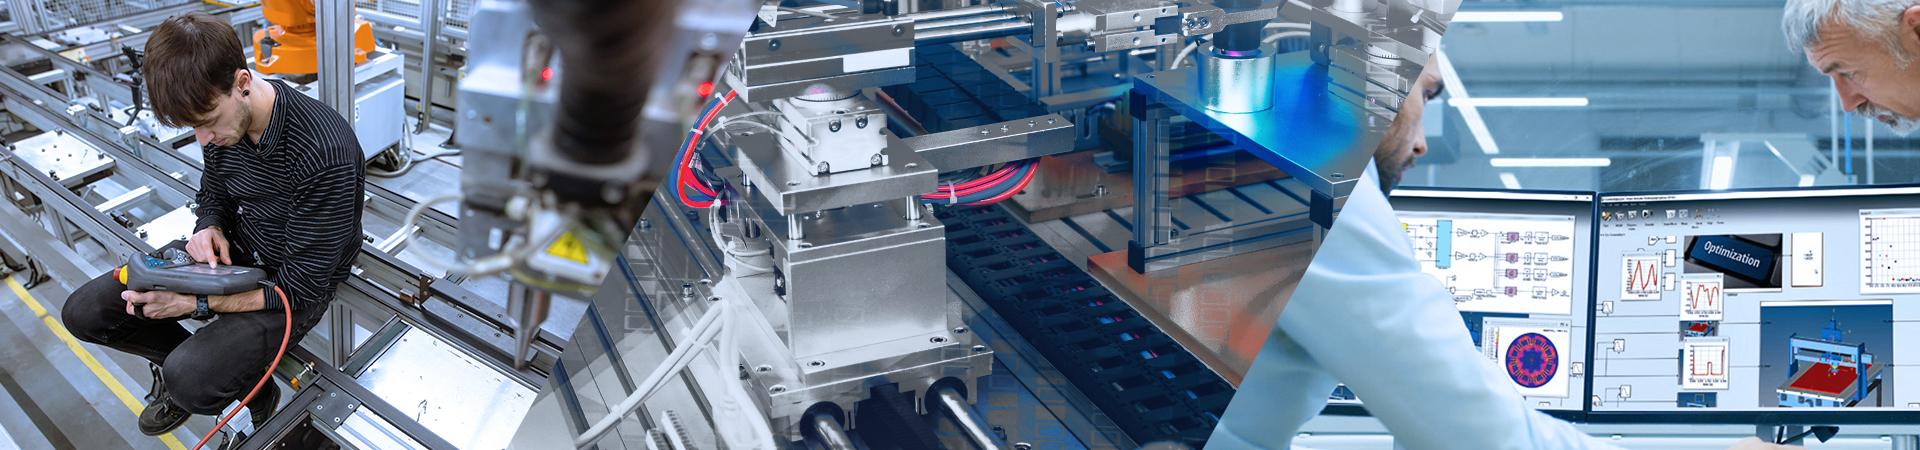 ATCx_Industrial-Machinery-3part-header-LP_06